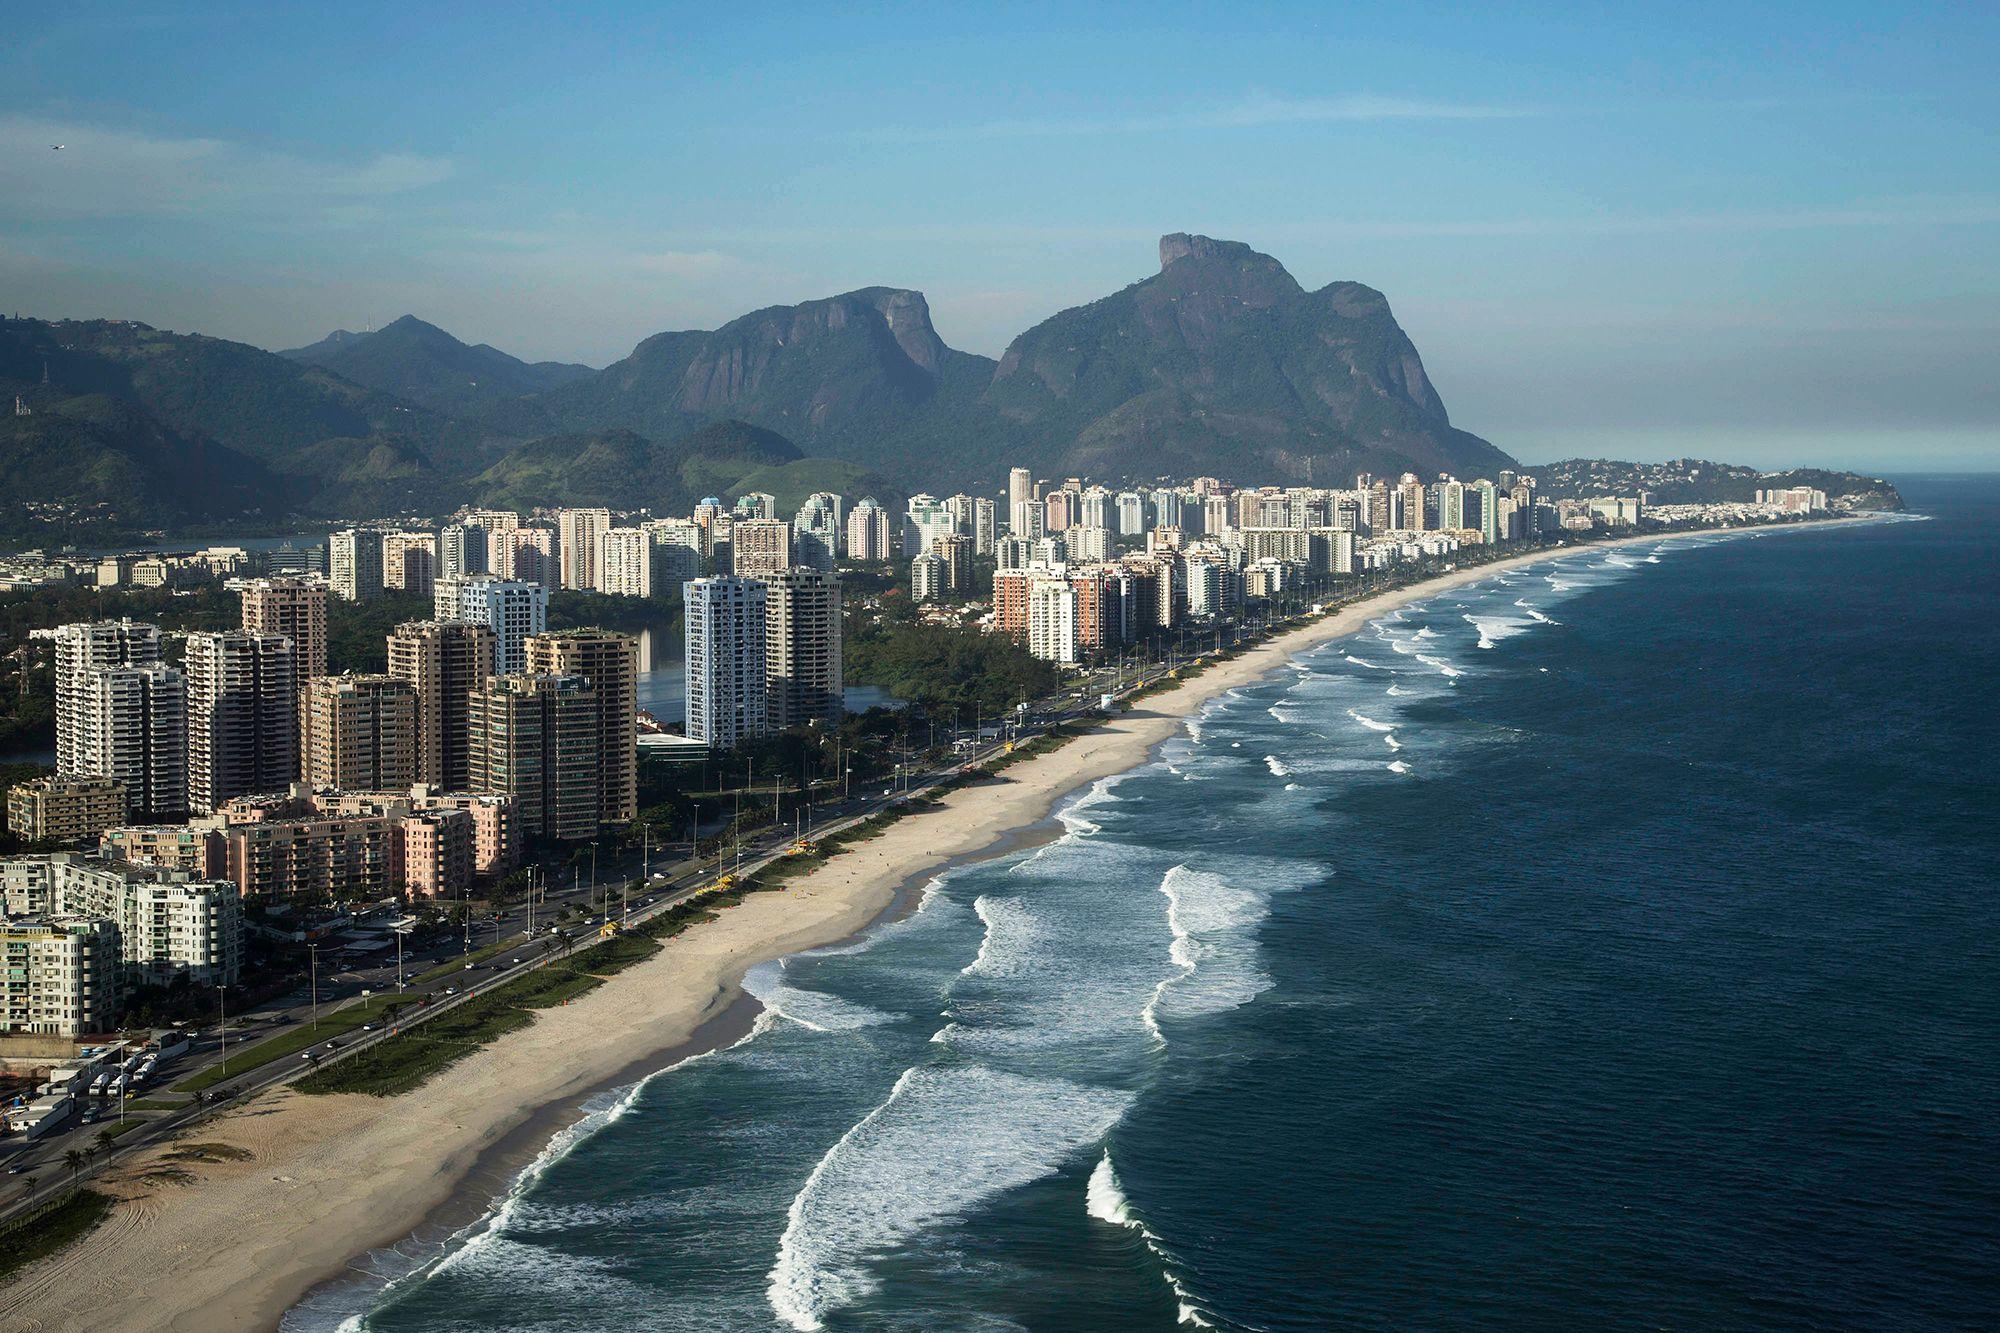 Barra da Tijuca beach, Rio de Janeiro, Brazil